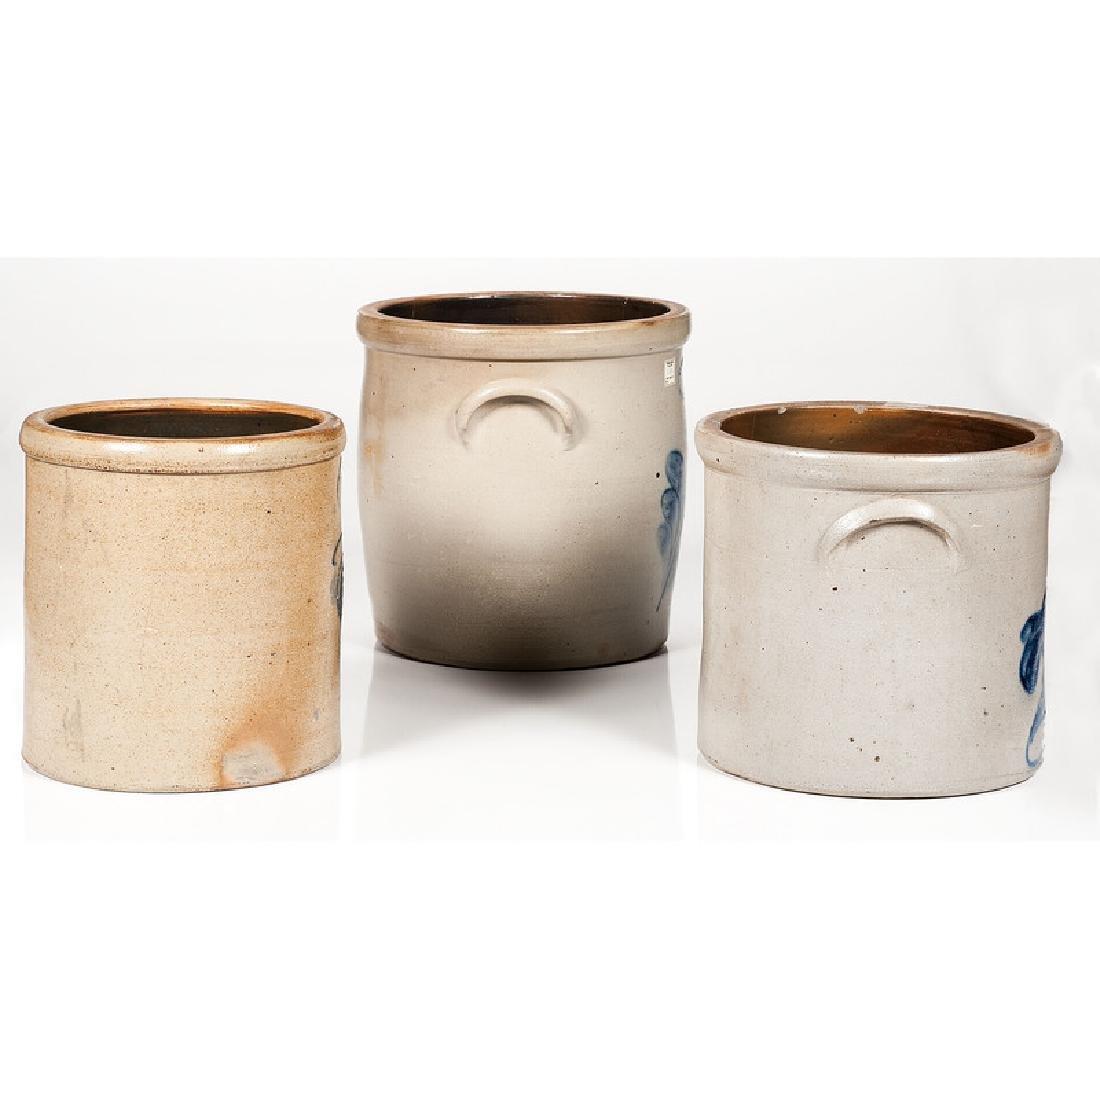 Cobalt Decorated Stoneware Crocks, Including J. Fisher - 2